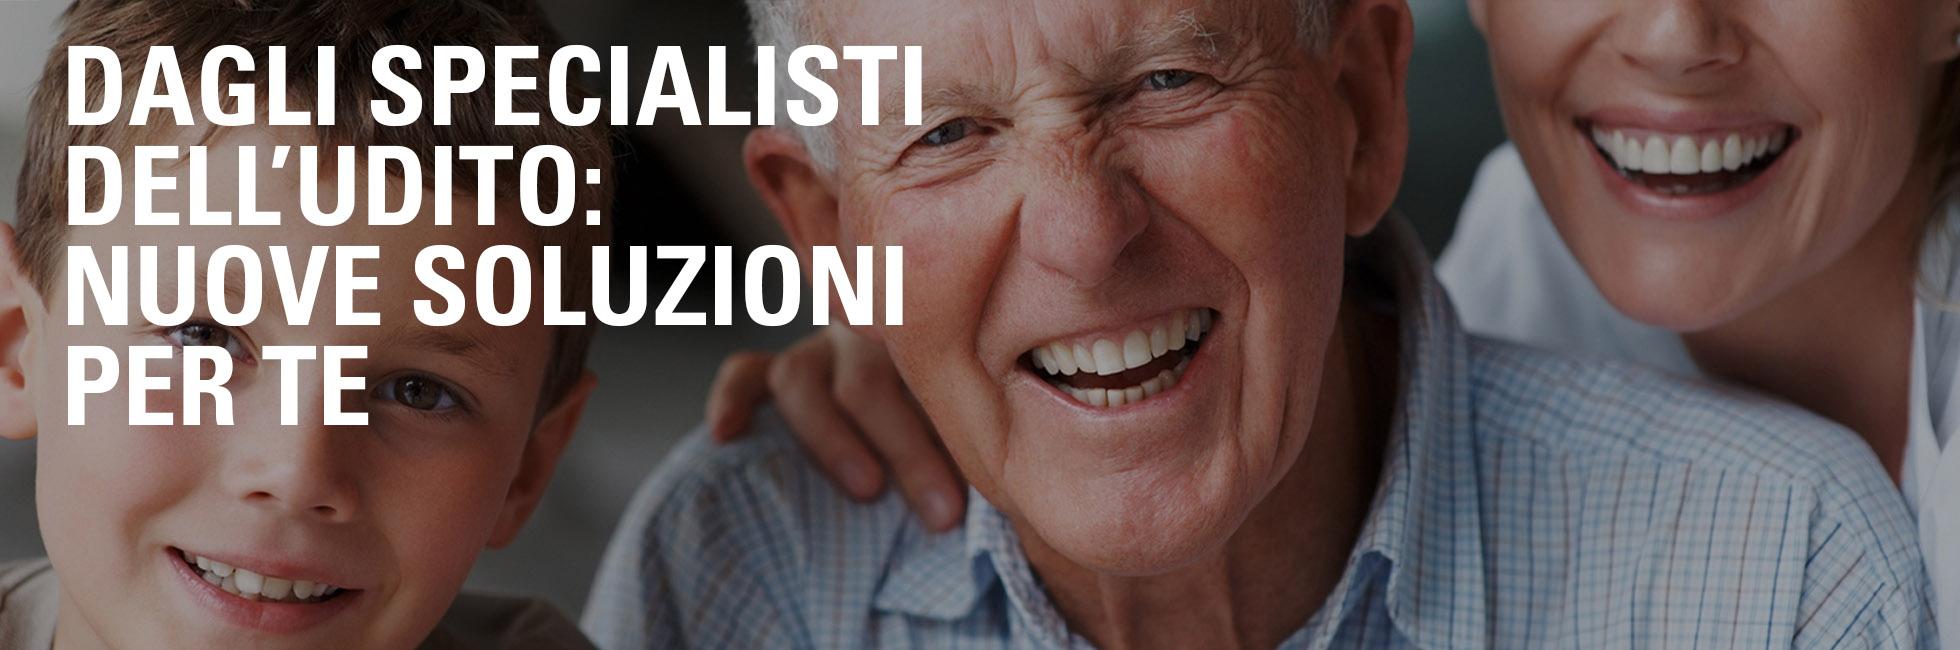 Udito_Finissimo_Apparecchi_Acustici_2B1_UDF